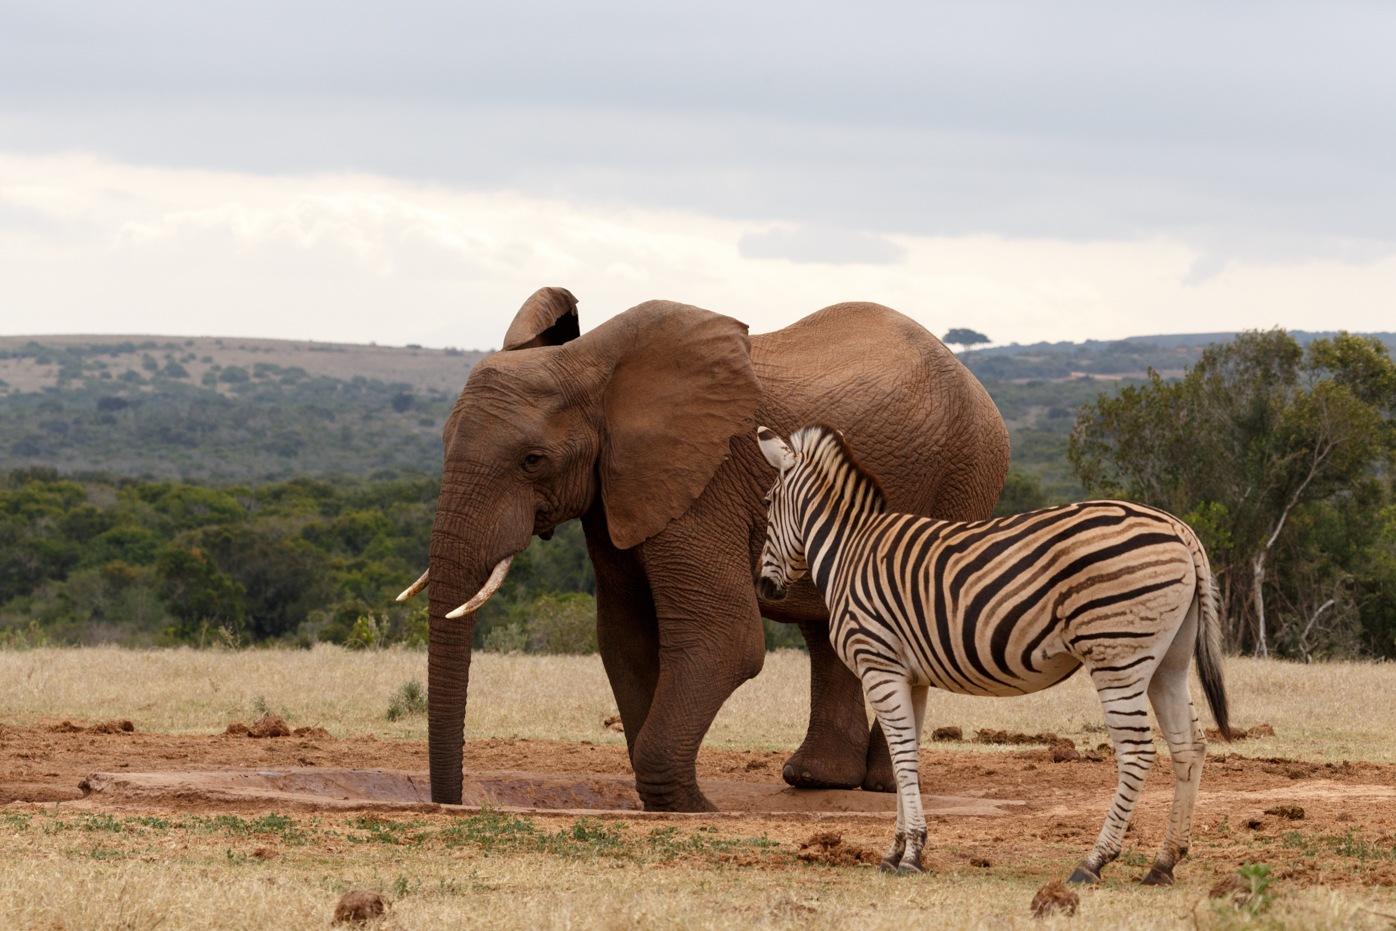 Elephant enjoying his water by Charissa de Scande Lotter